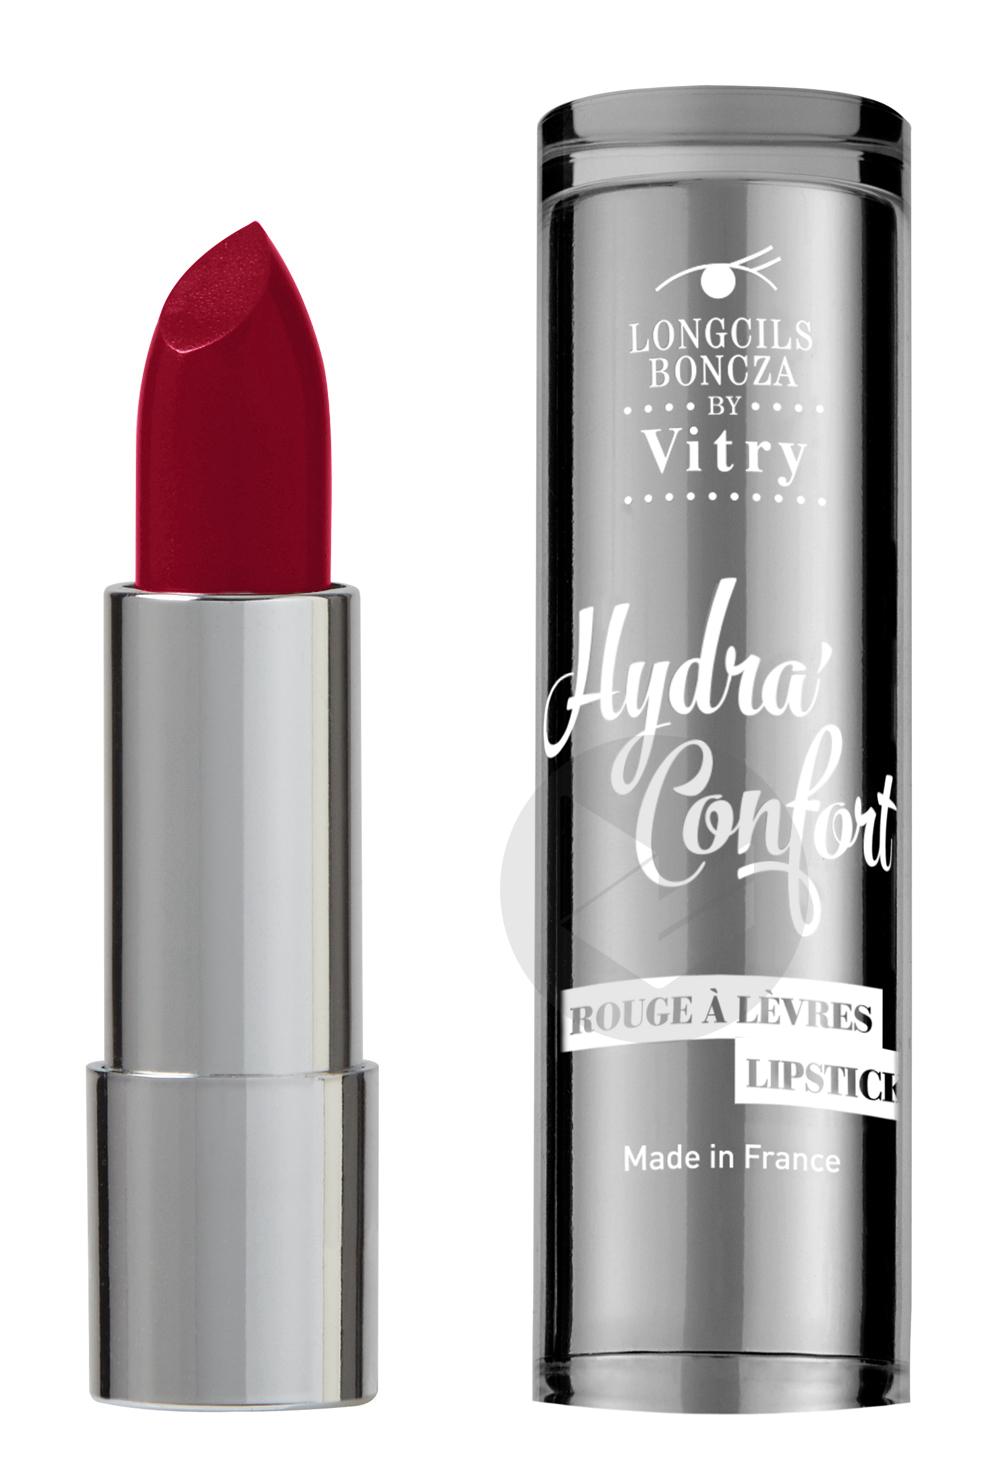 Hydra Confort Rouge A Levres Carmin